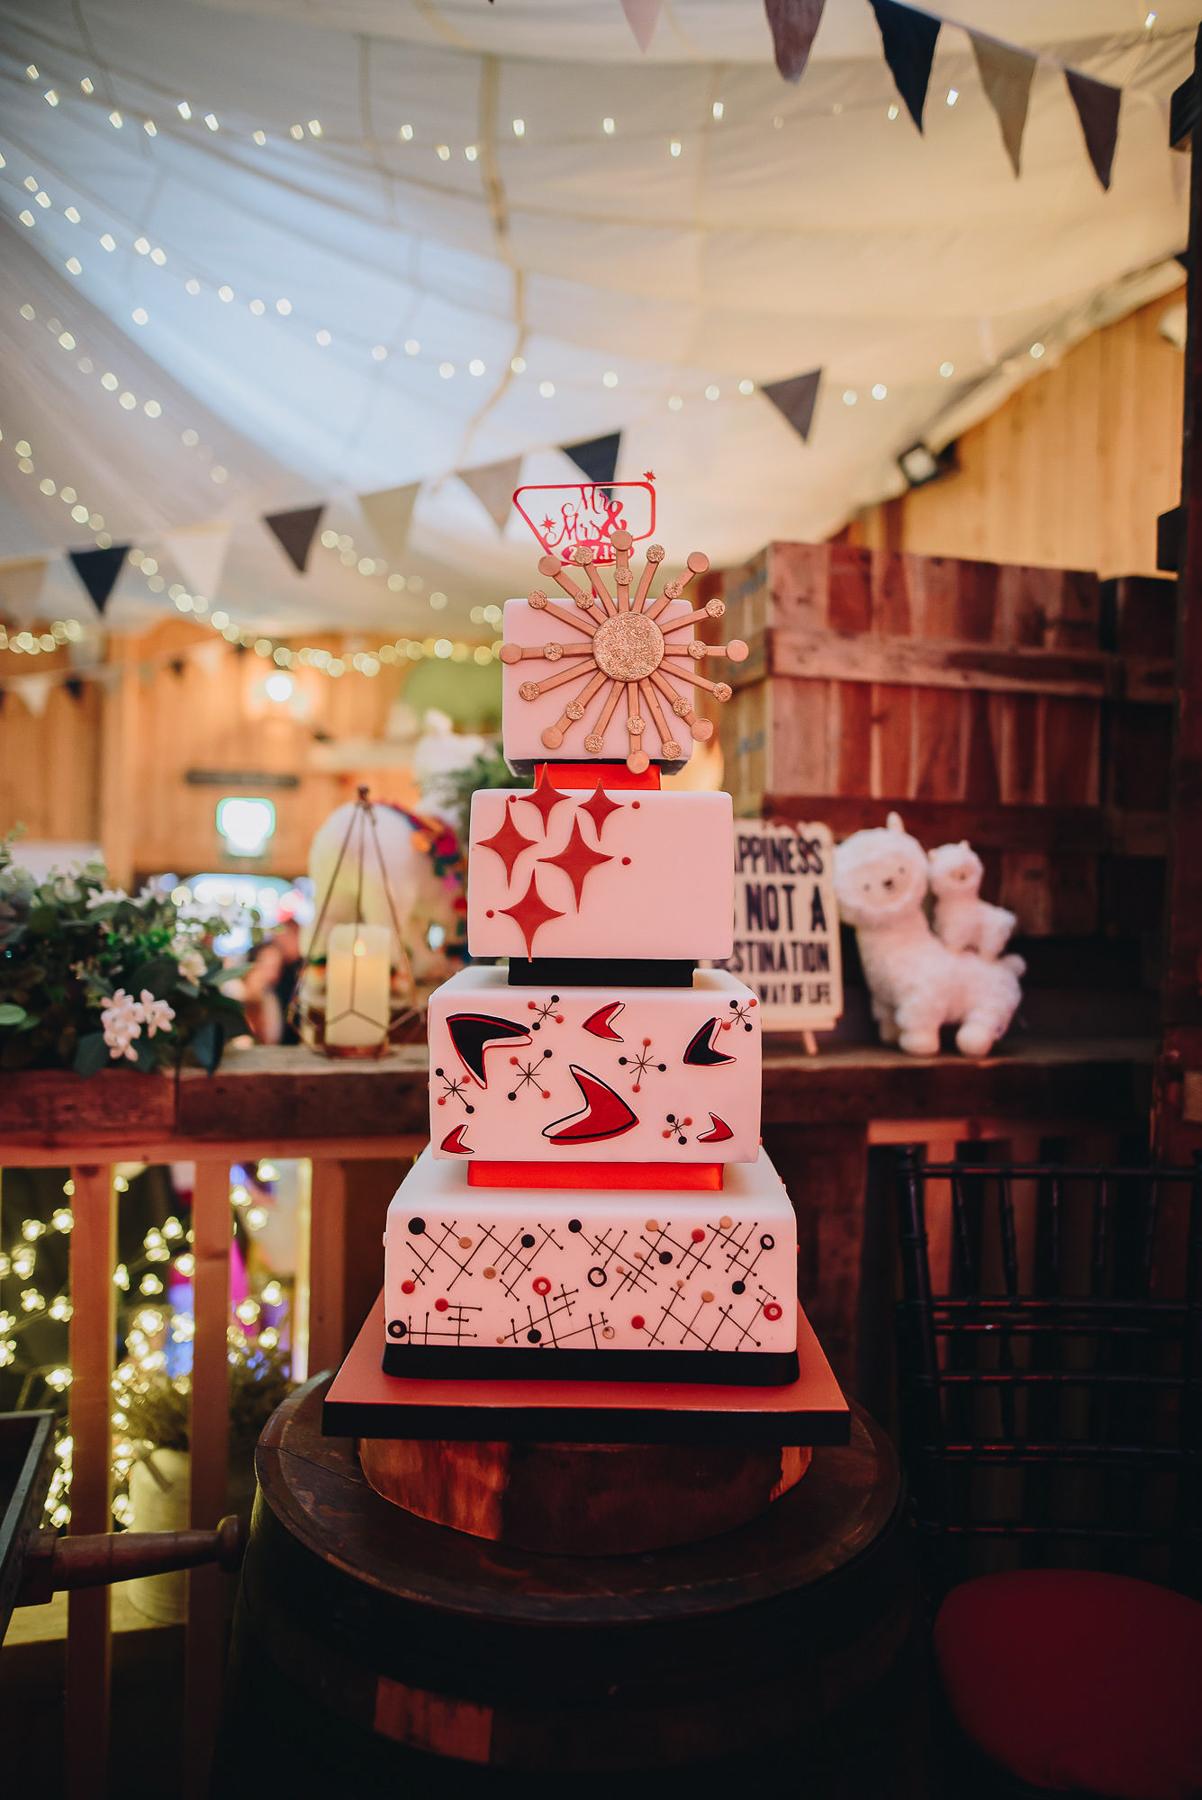 Wellbeing_Farm_Wedding_Photography_The_Pin-Up_Bride_Lara_Shaun-111.jpg